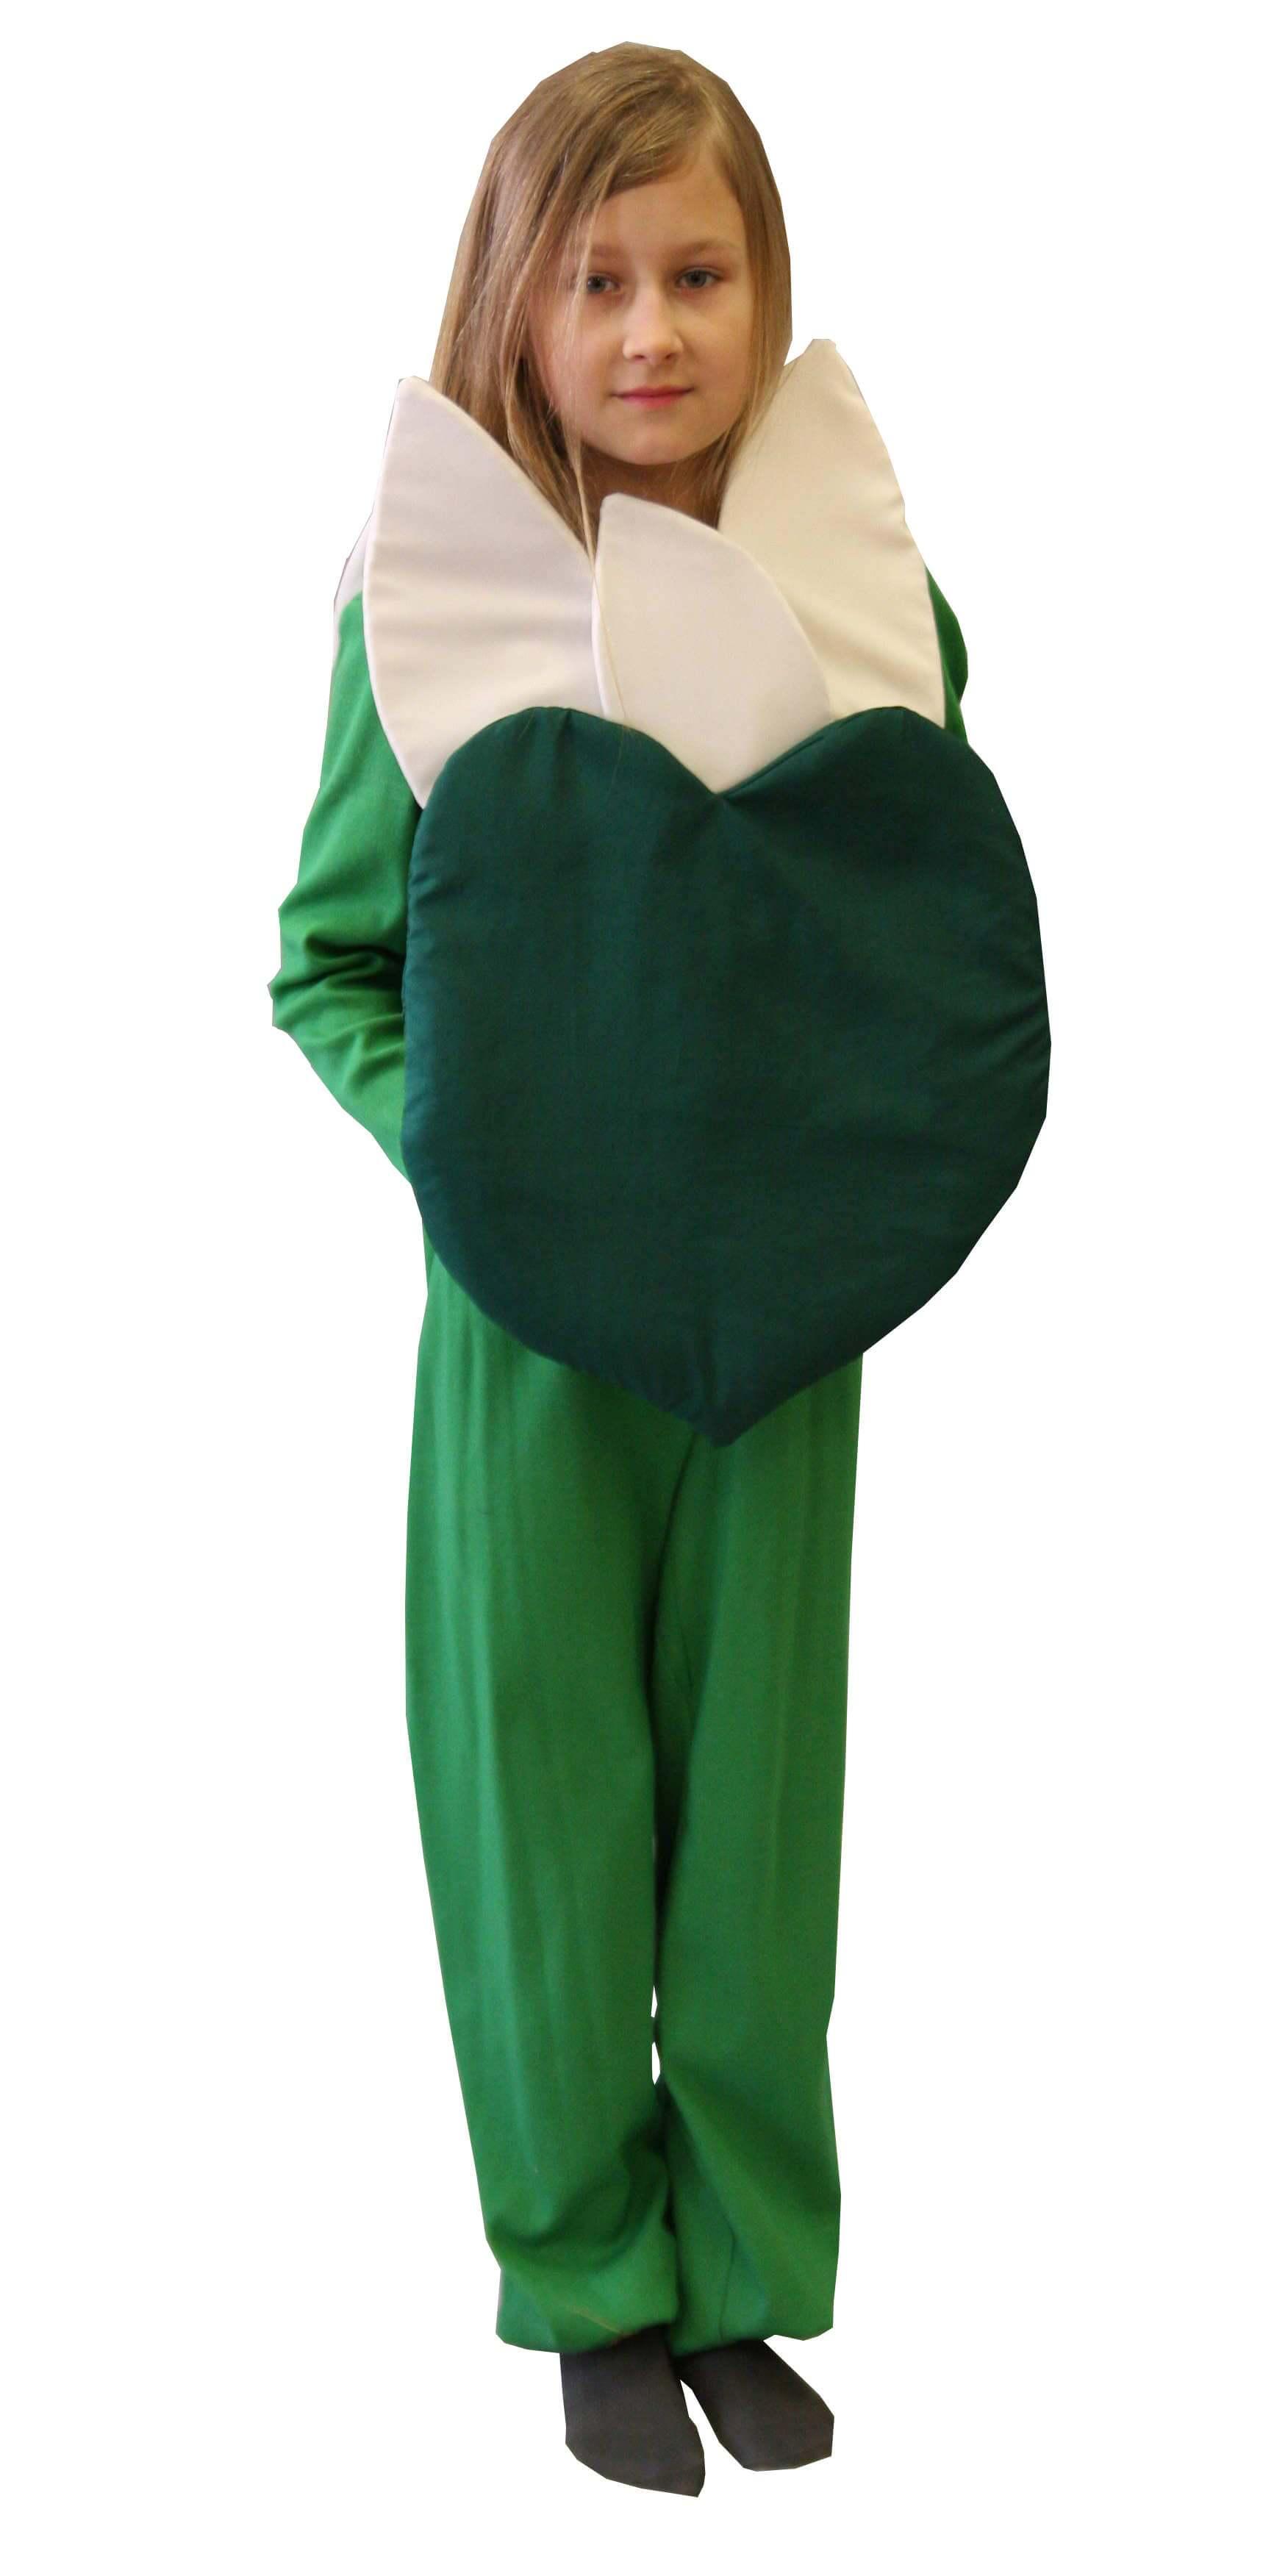 Ropės kostiumas. Kaina 15 Eur.